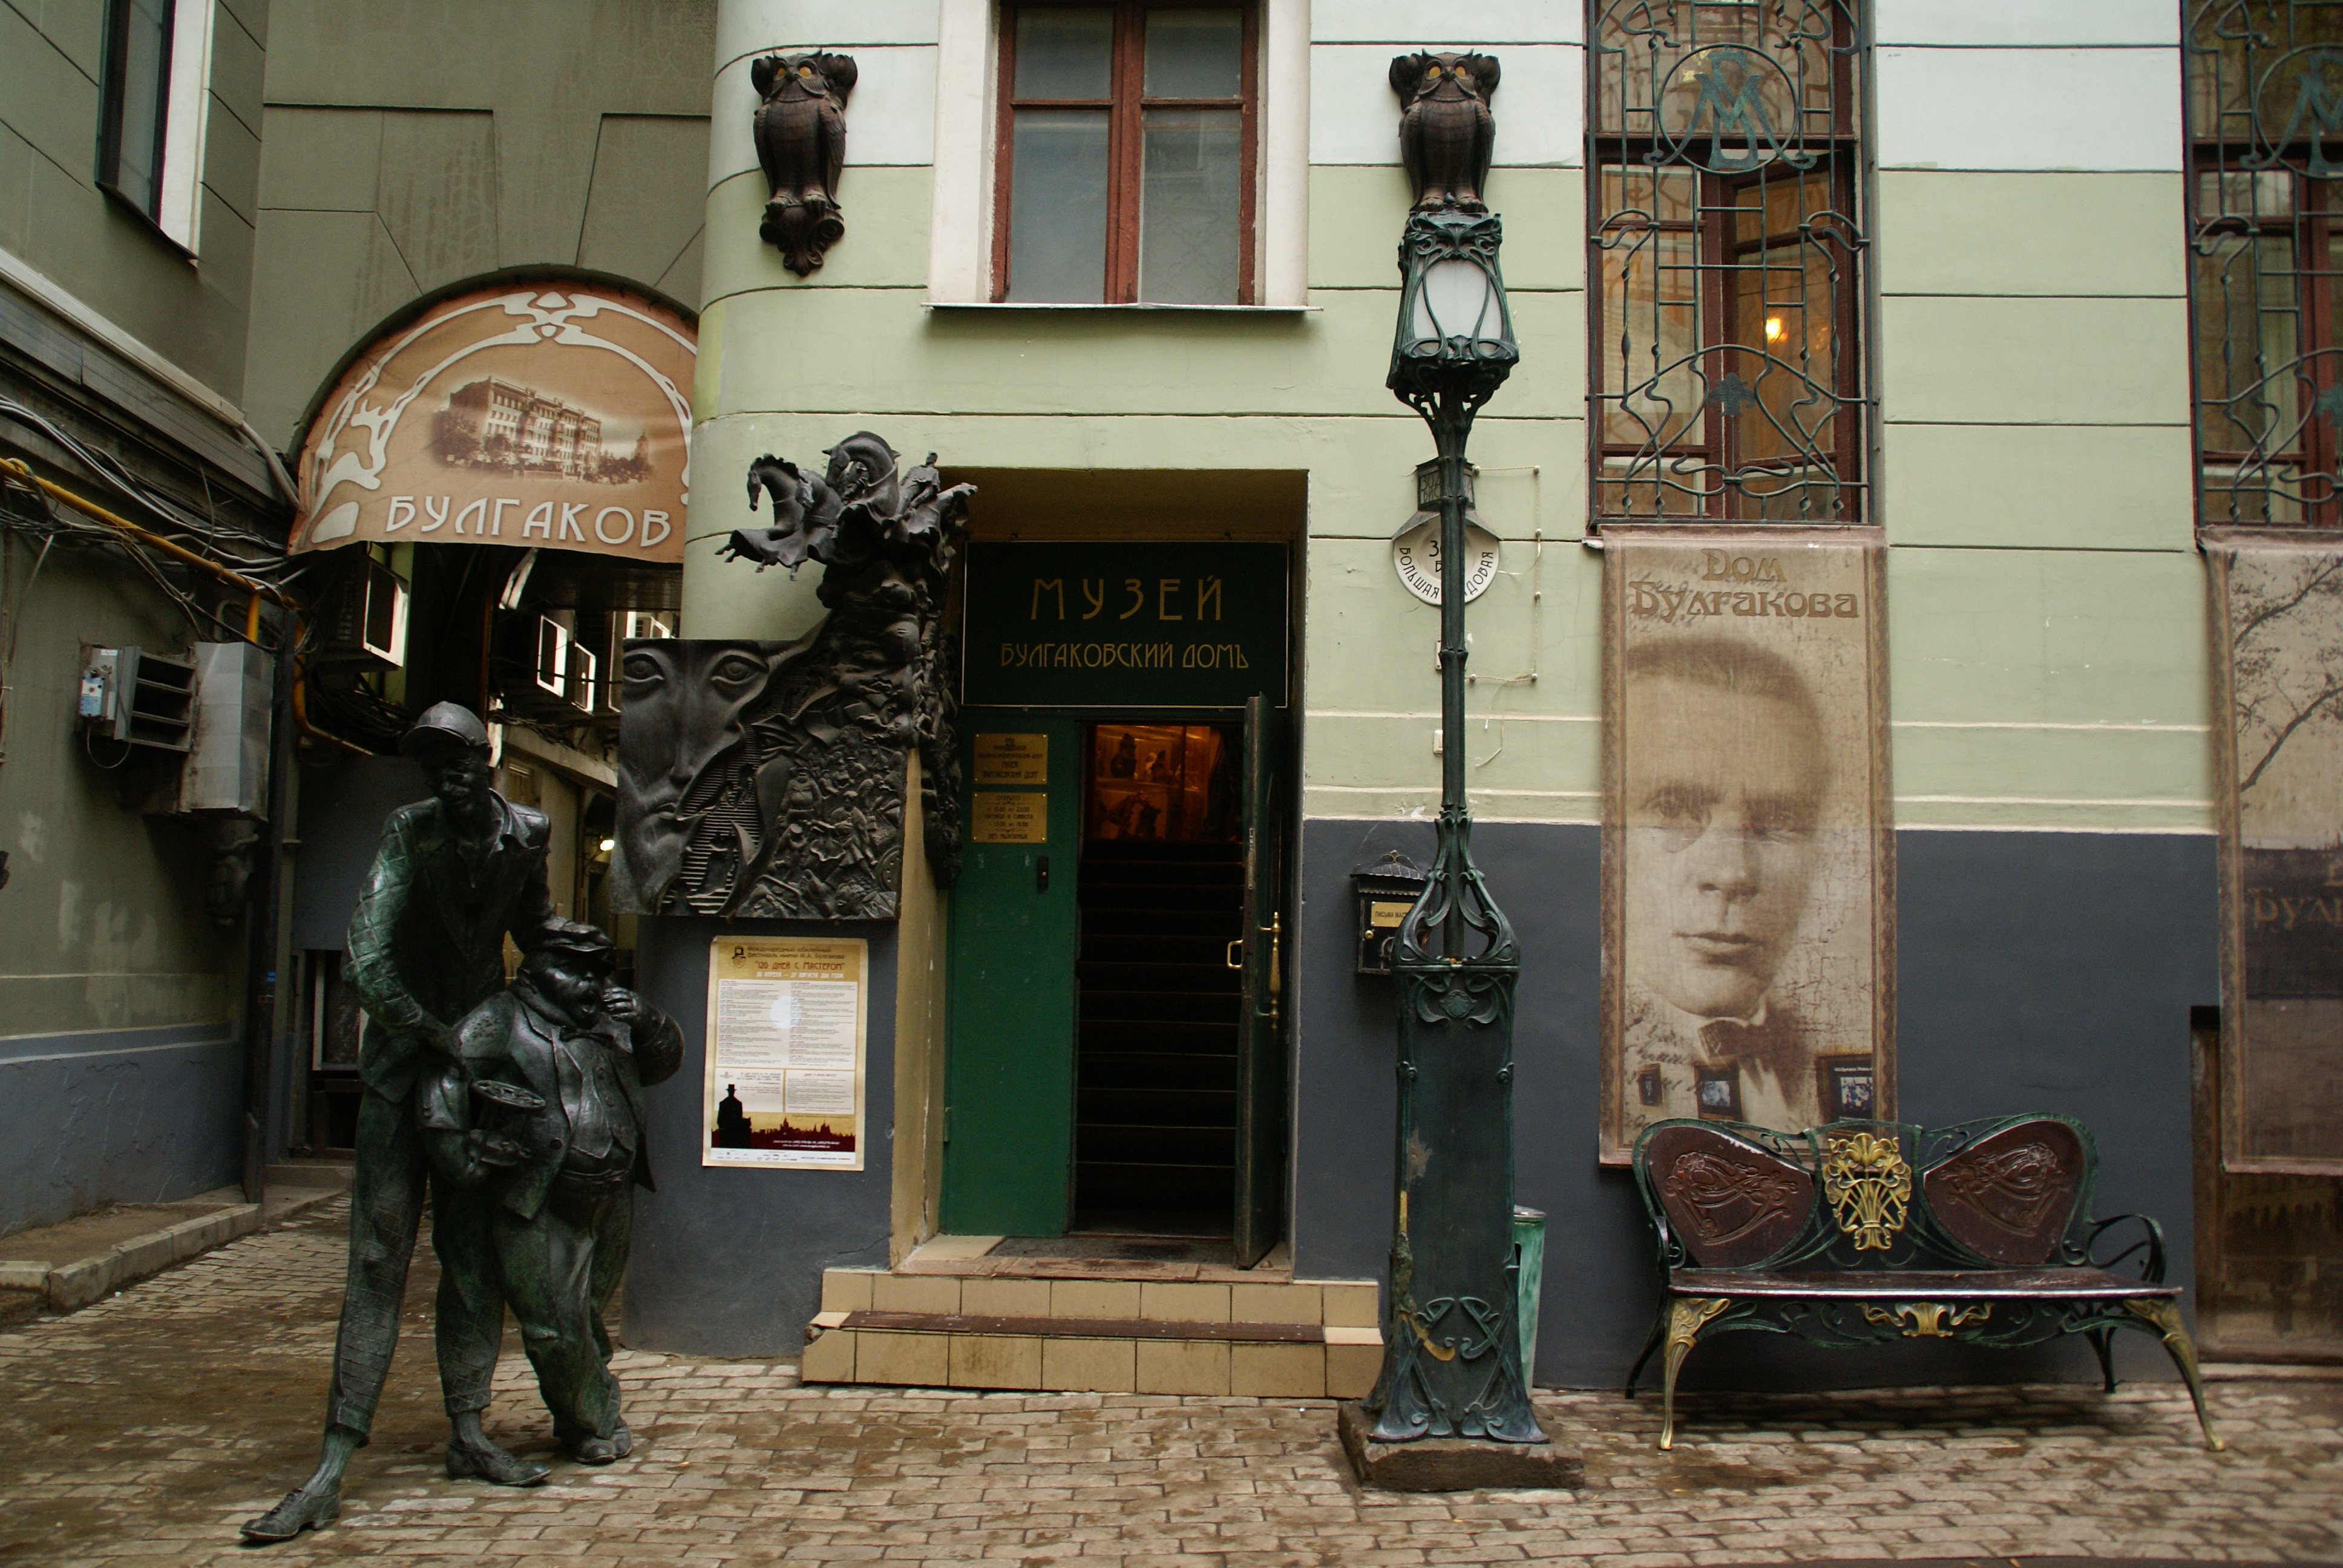 Фасад музея Булгакова приведут в порядок по программе «Моя улица»